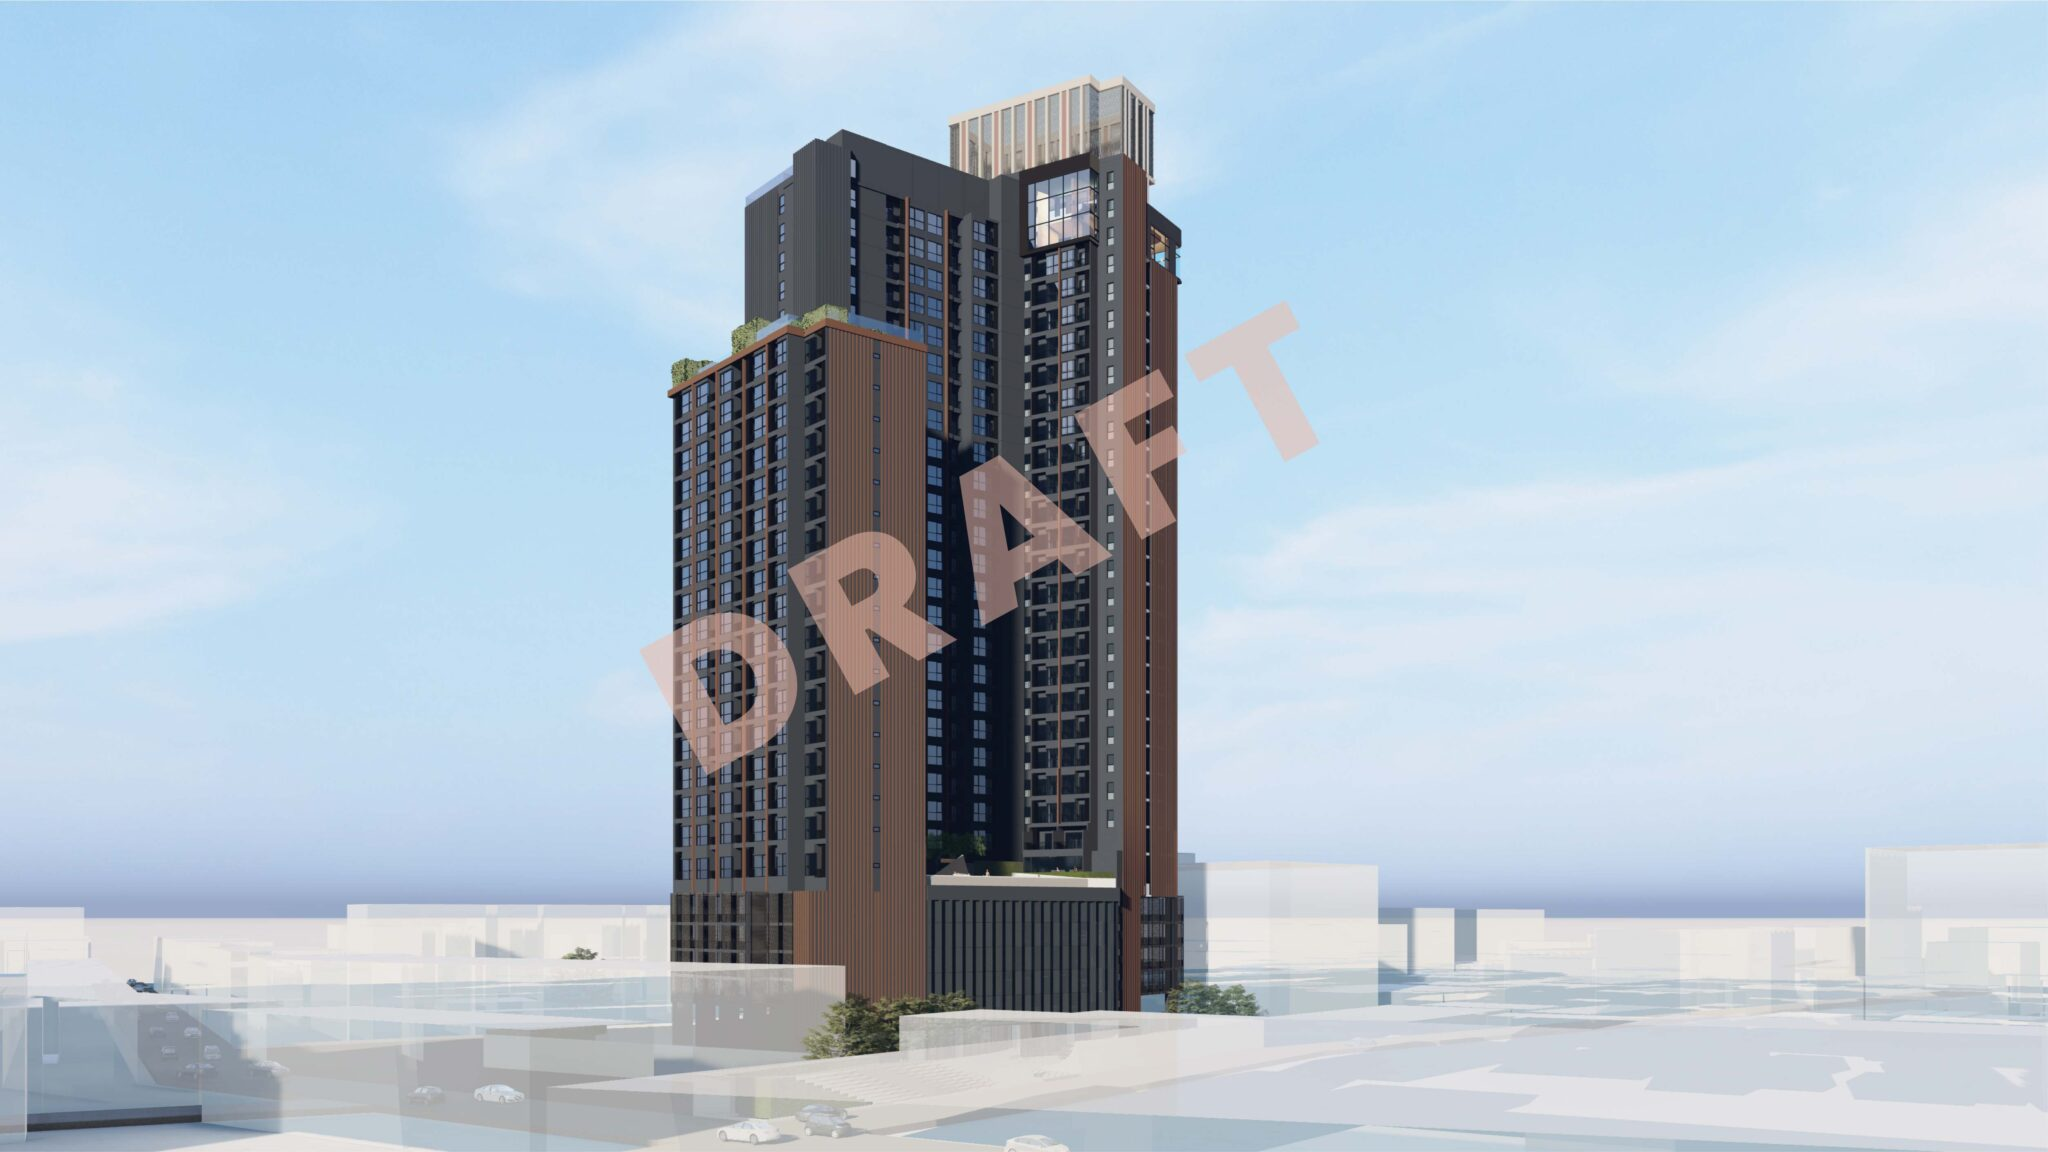 PREVIEW THE STAGE mindscape Ratchada  Huaikwang คอนโดใหม่ใจกลางรัชดาจาก REAL ASSET | Prop2Morrow บ้าน คอนโด ข่าวอสังหาฯ